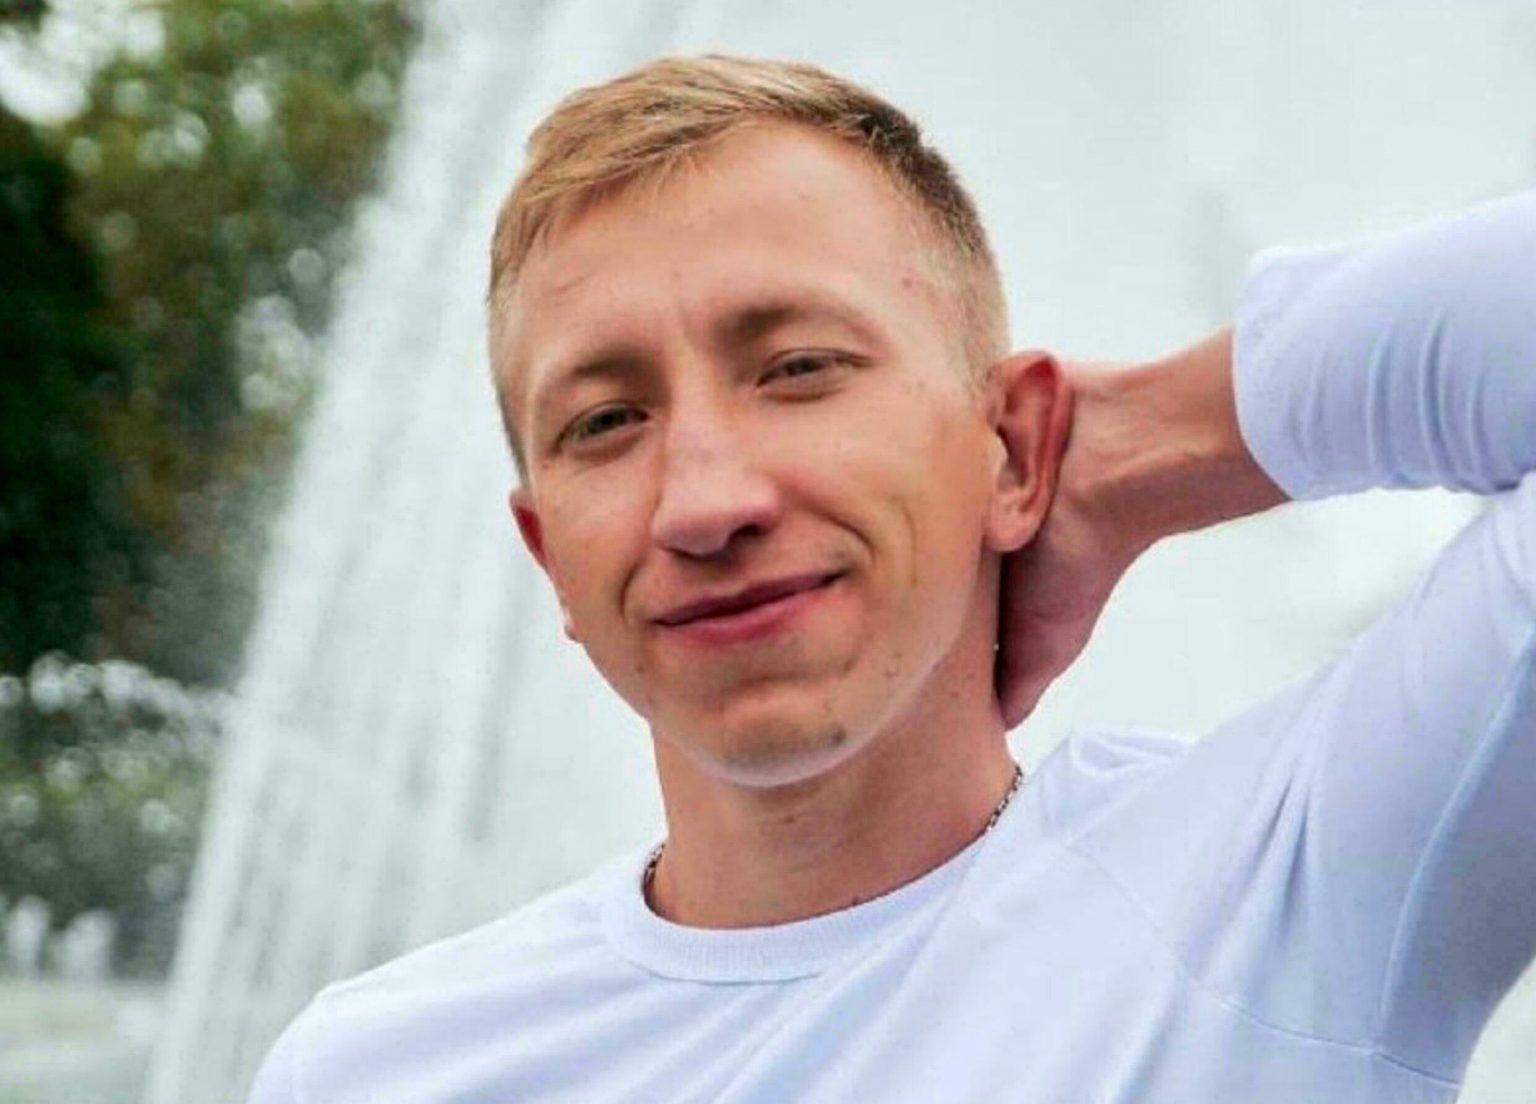 Missing Belarus exile group leader Vitaly Shishov found hanged in Ukraine